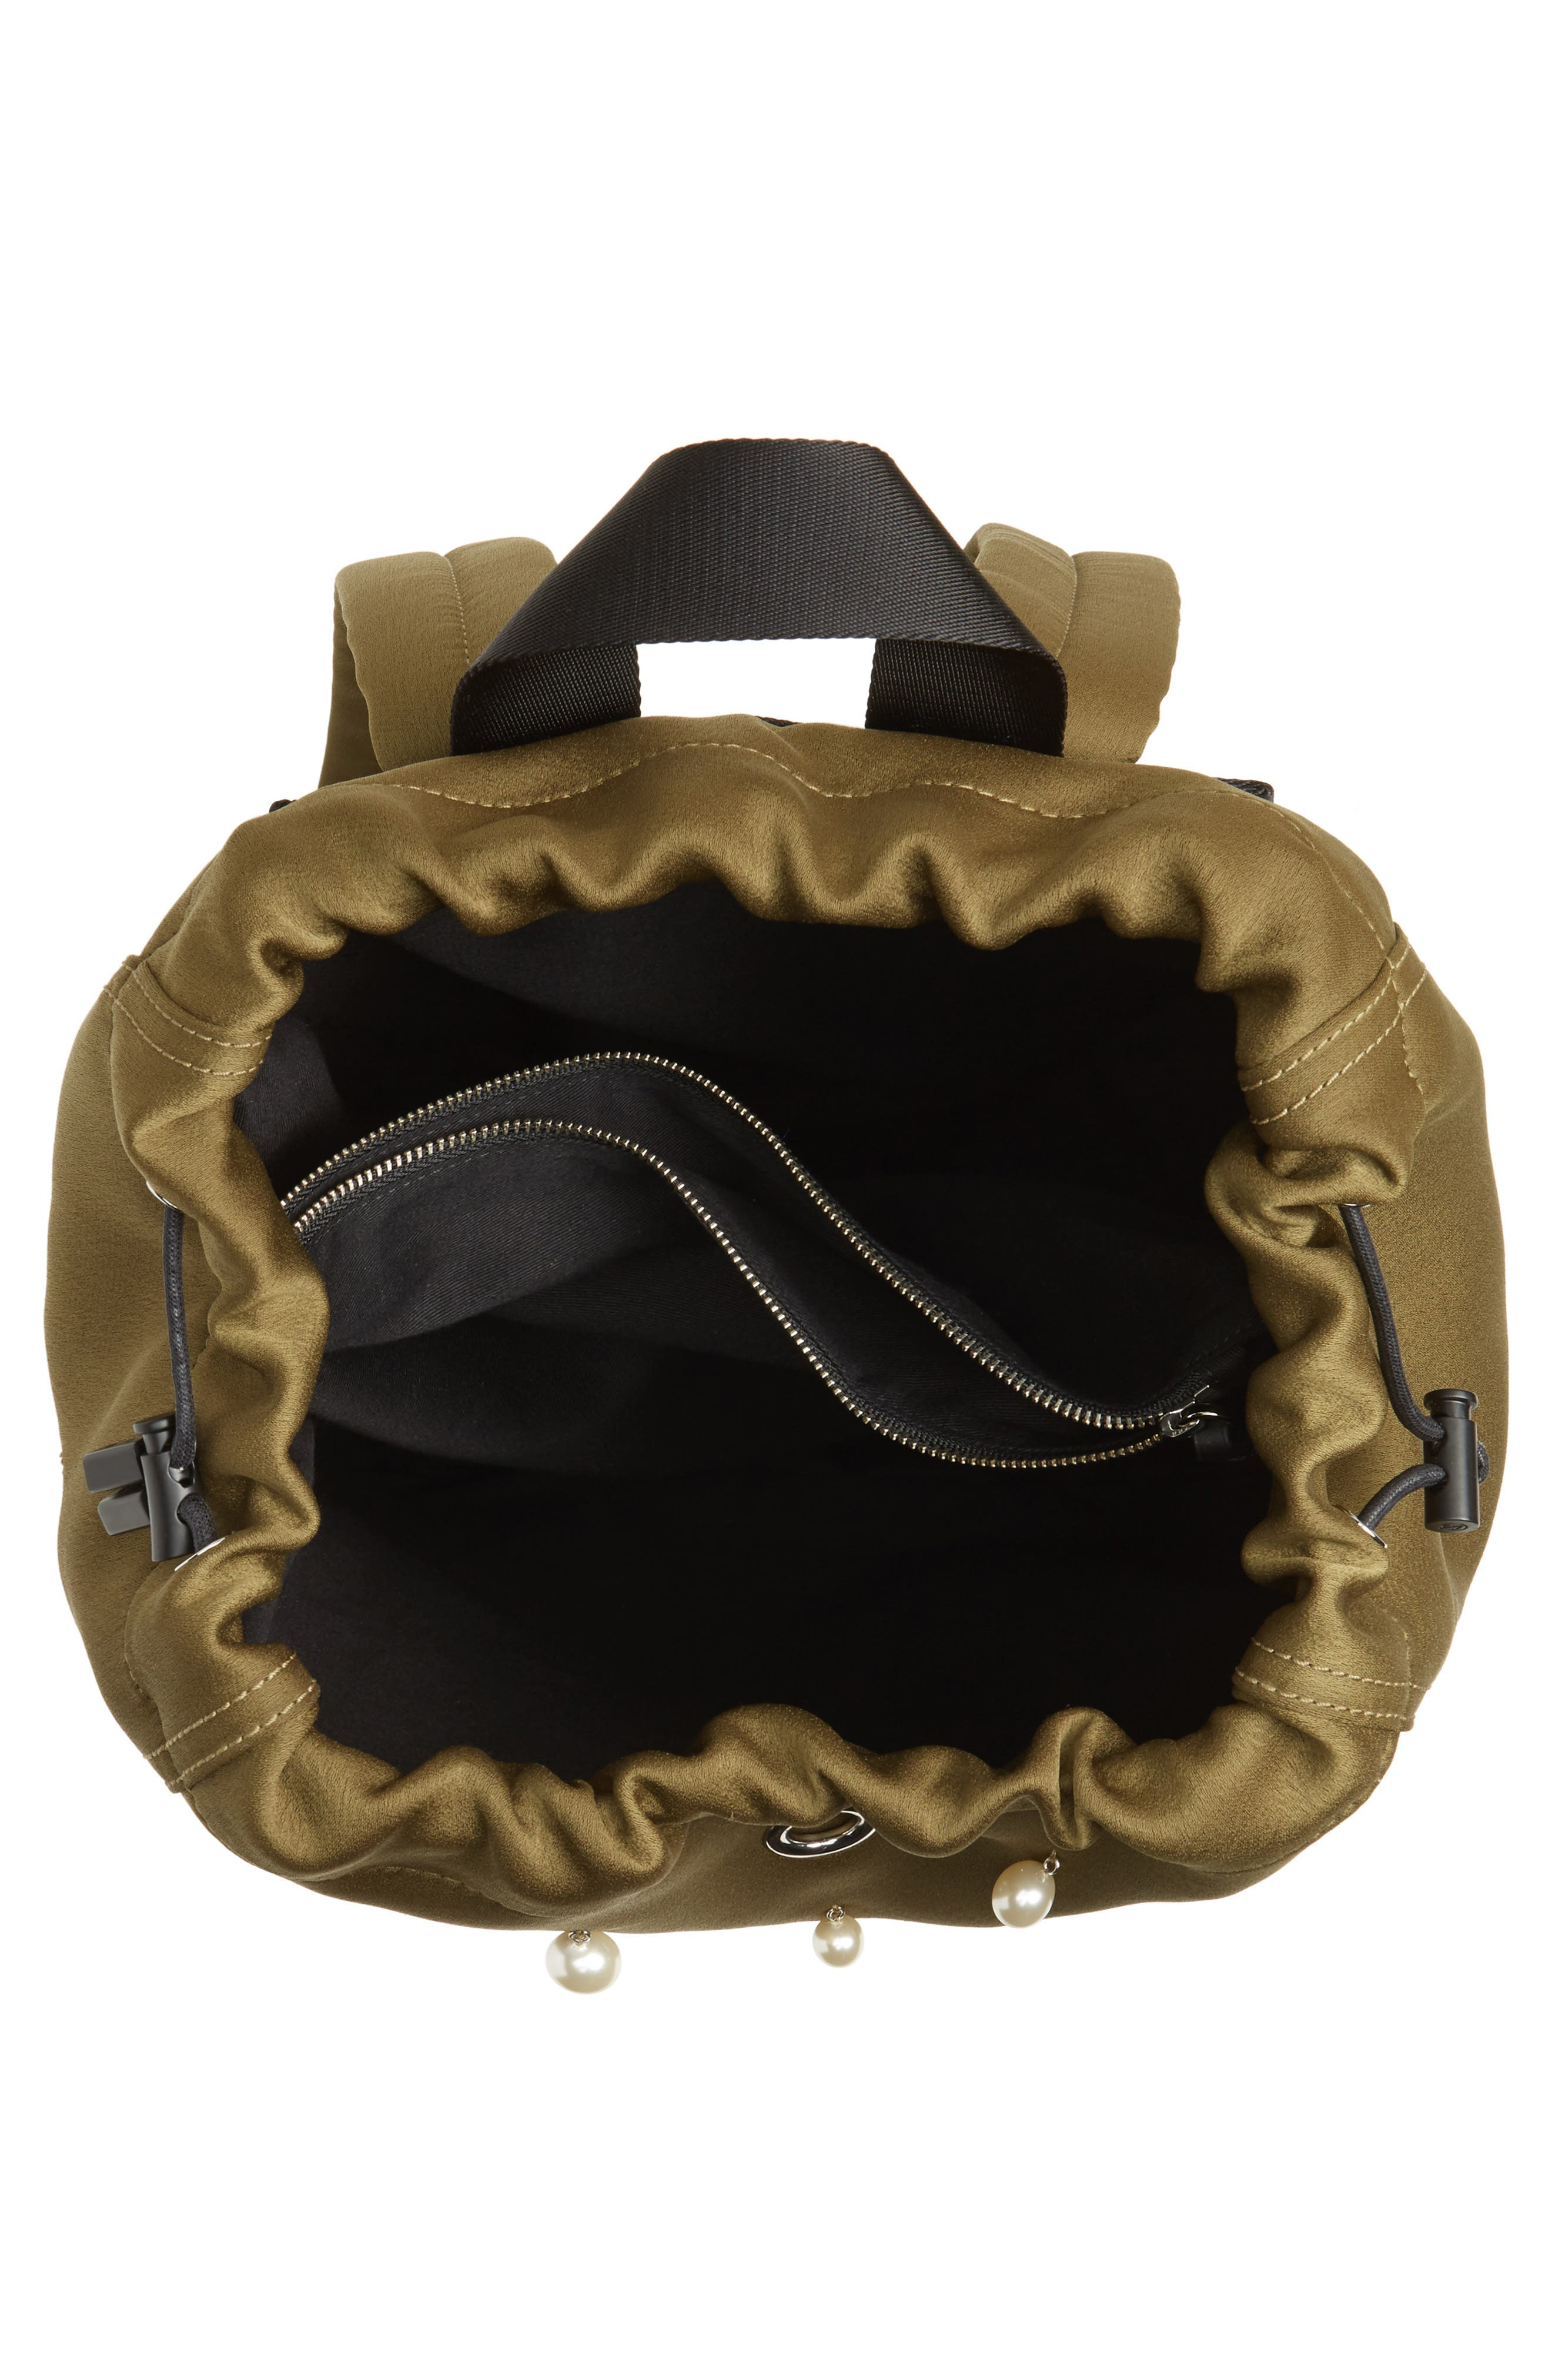 Phillip Lim 3.1 Medium Go-Go Embellished Backpack,                             Alternate thumbnail 7, color,